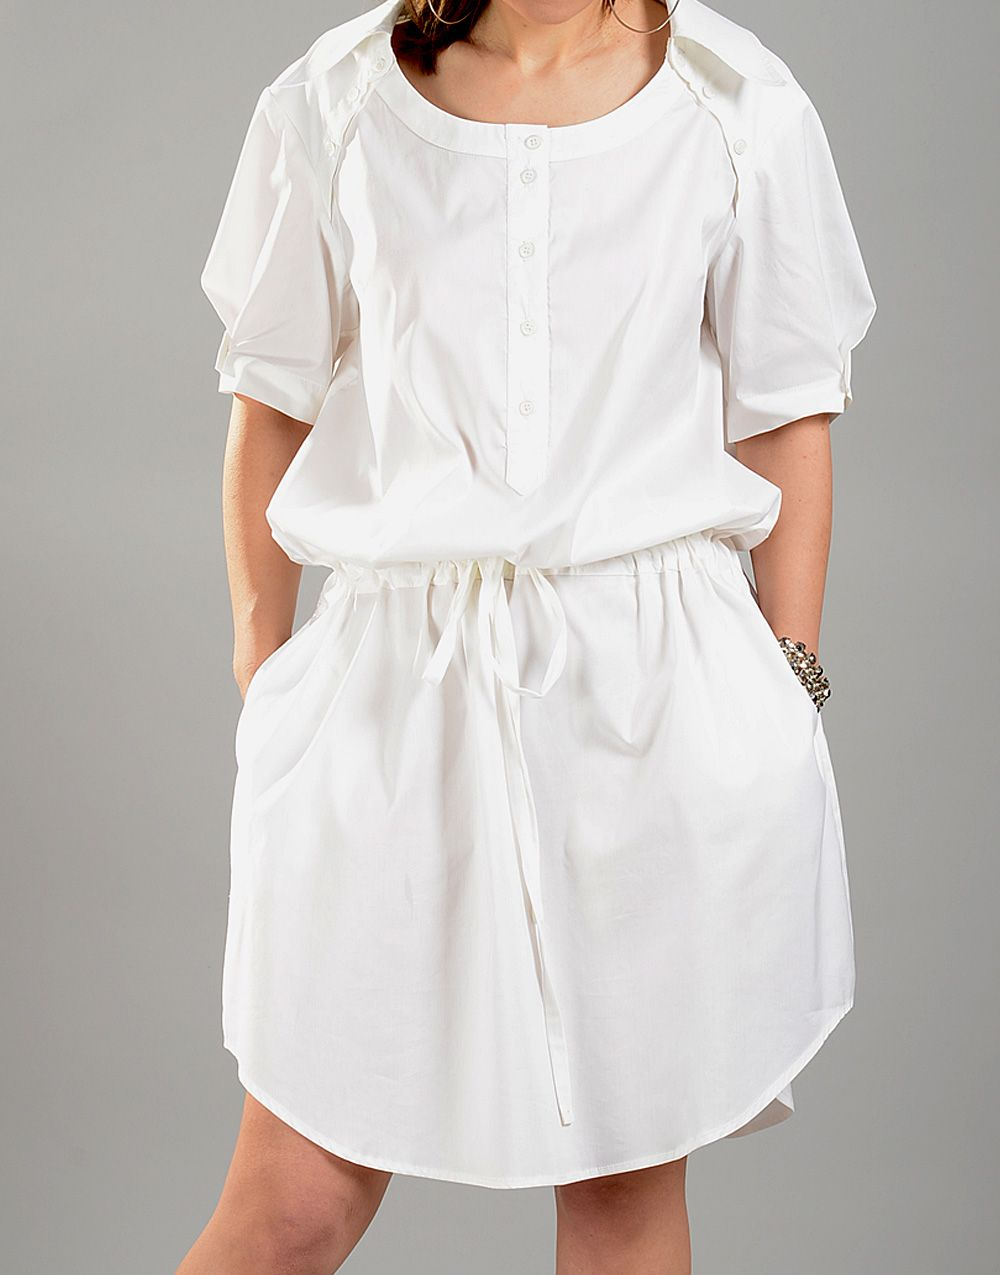 White Tunic Dress Beach Dress Sun Dress Cotton Dress Spring Dress Extravagant Dress White Dr White Boho Dress Casual Dresses Plus Size Casual White Dress [ 1275 x 1000 Pixel ]